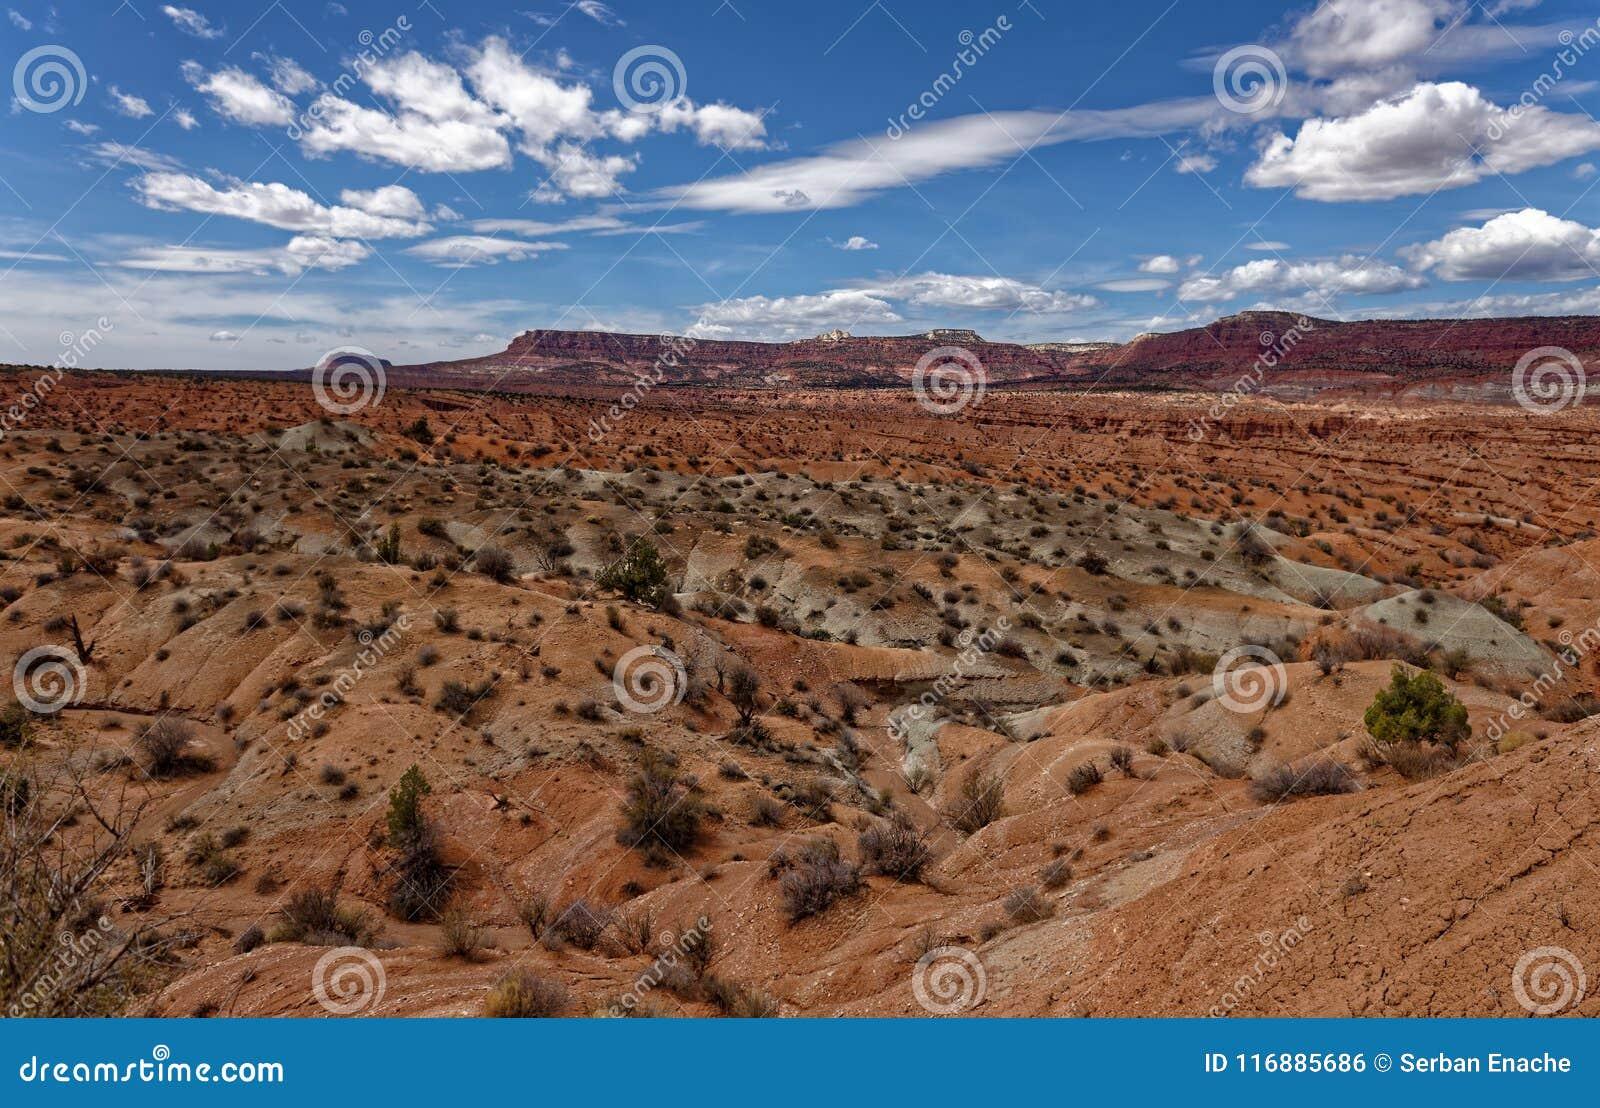 Pustynne równiny w Utah